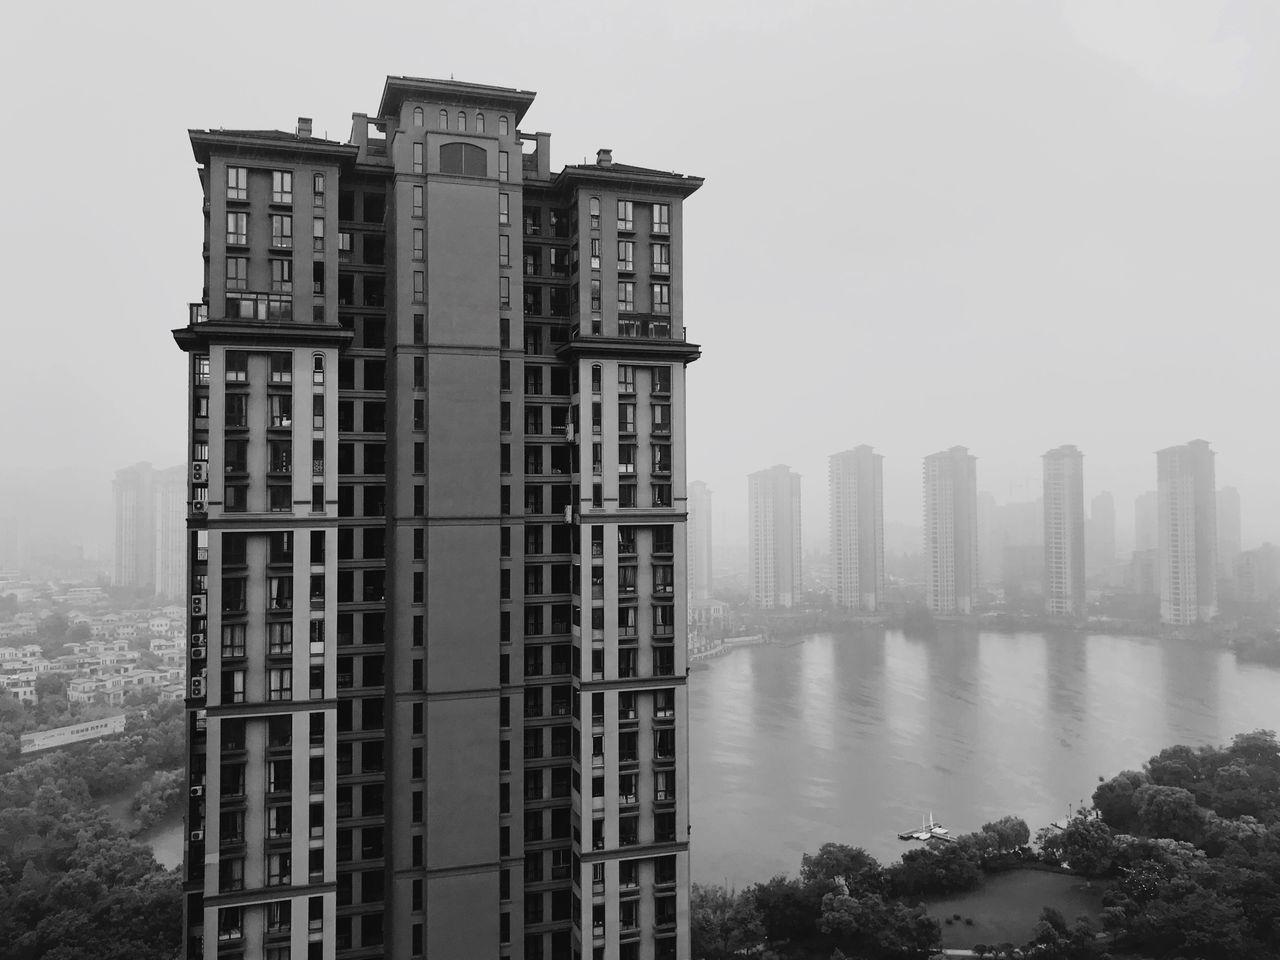 Building,  Building Exterior,  Built Structure,  China,  City